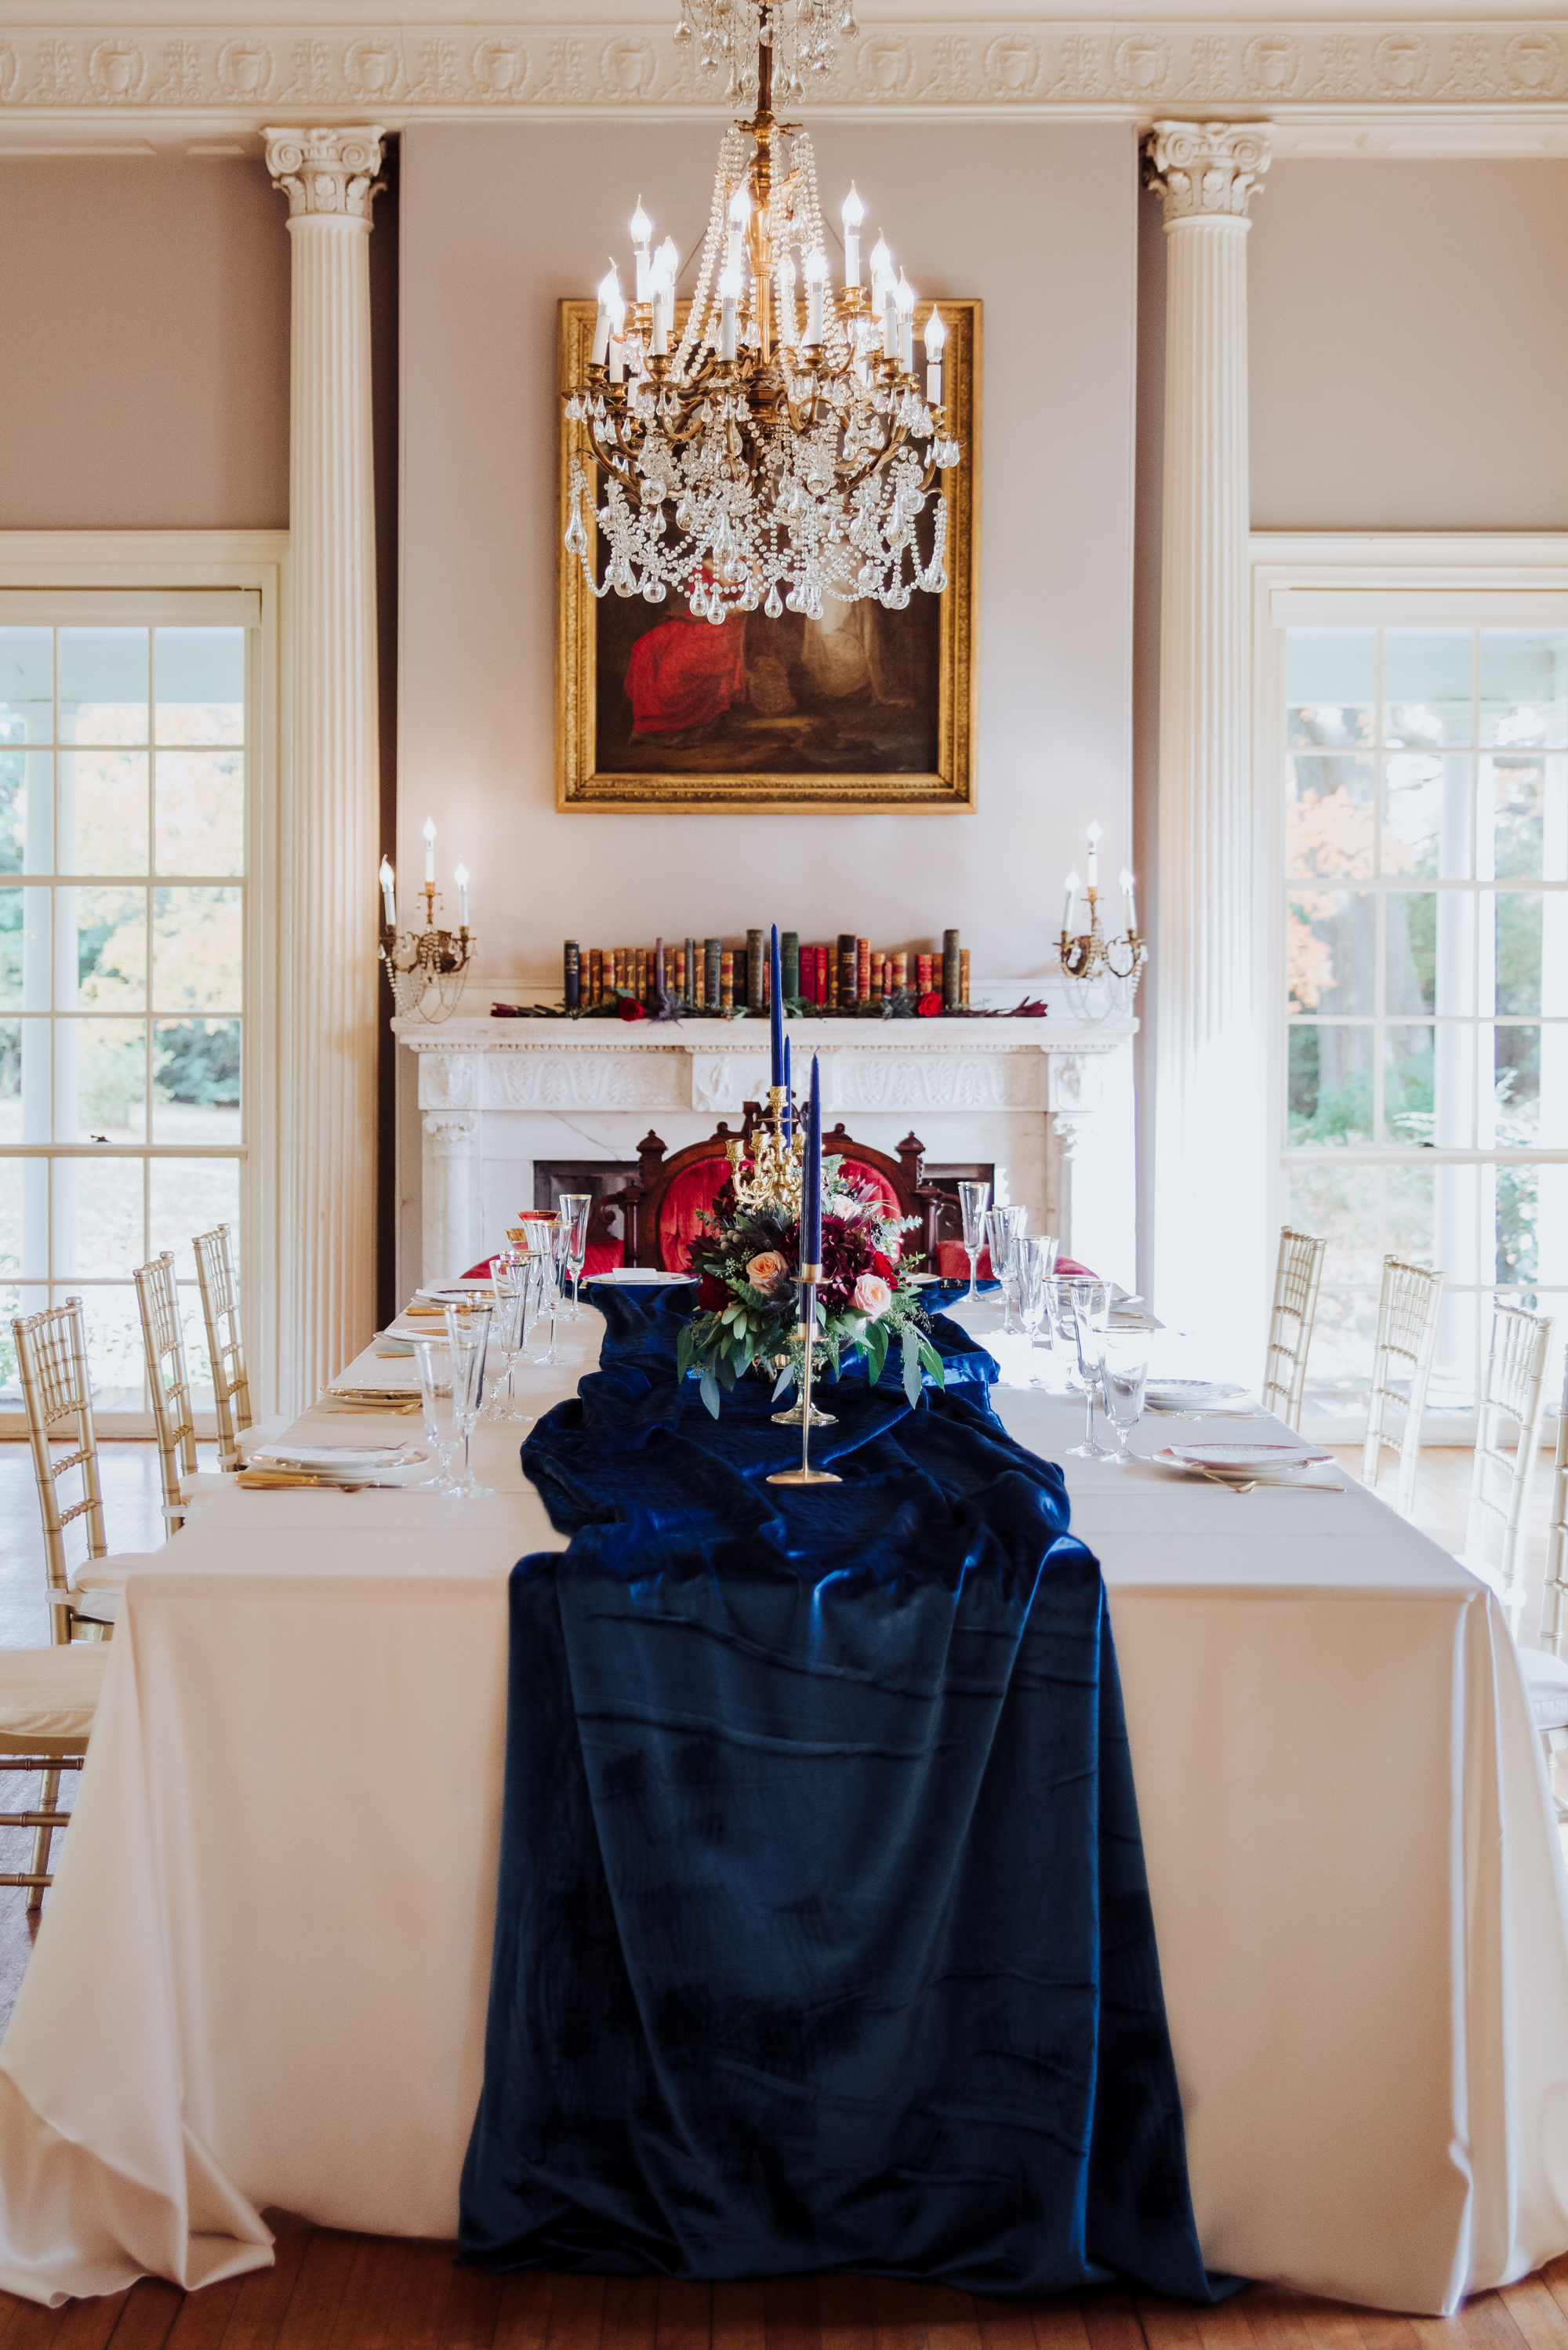 graceful regal wedding venue interior chandelier dining room ball room royal blue accent